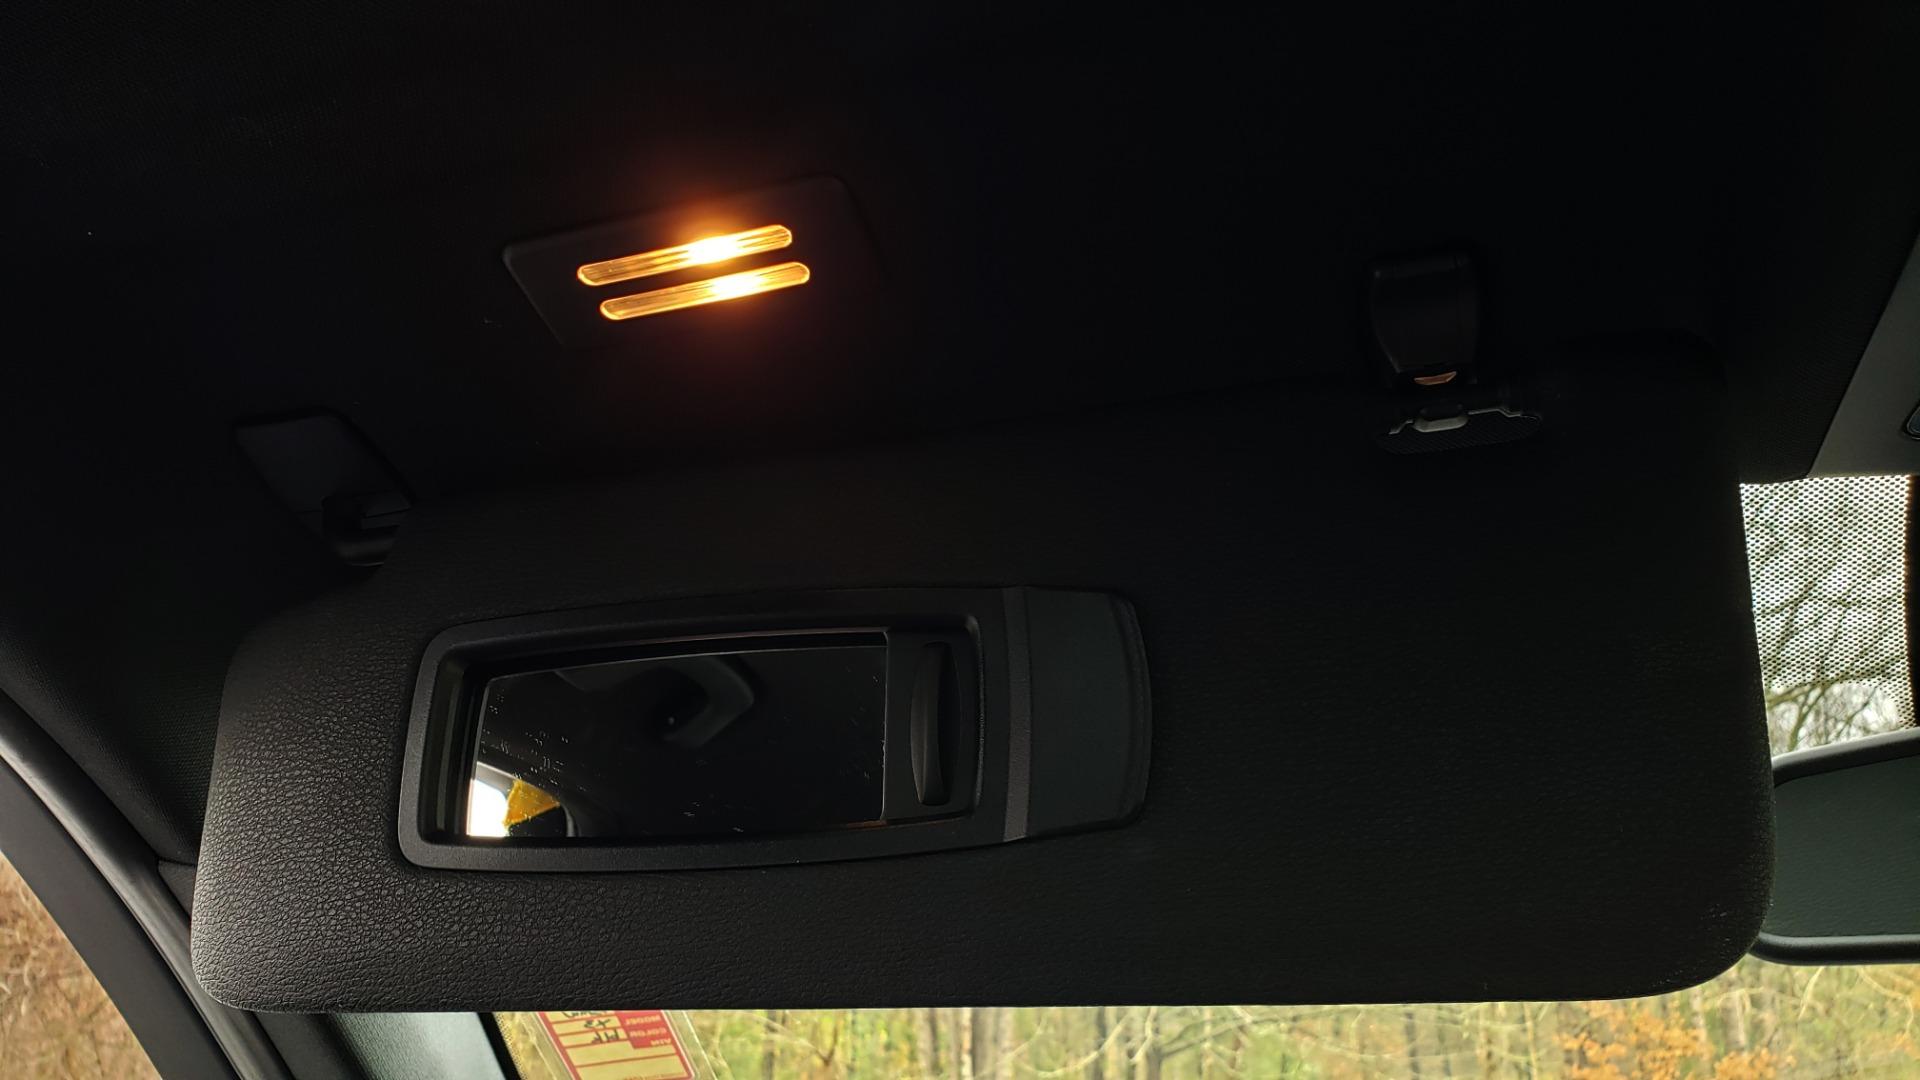 Used 2017 BMW X3 XDRIVE35I M-SPORT / DRVR ASST PLUS / TECHNOLOGY / HUD / BLIND SPOT for sale Sold at Formula Imports in Charlotte NC 28227 53